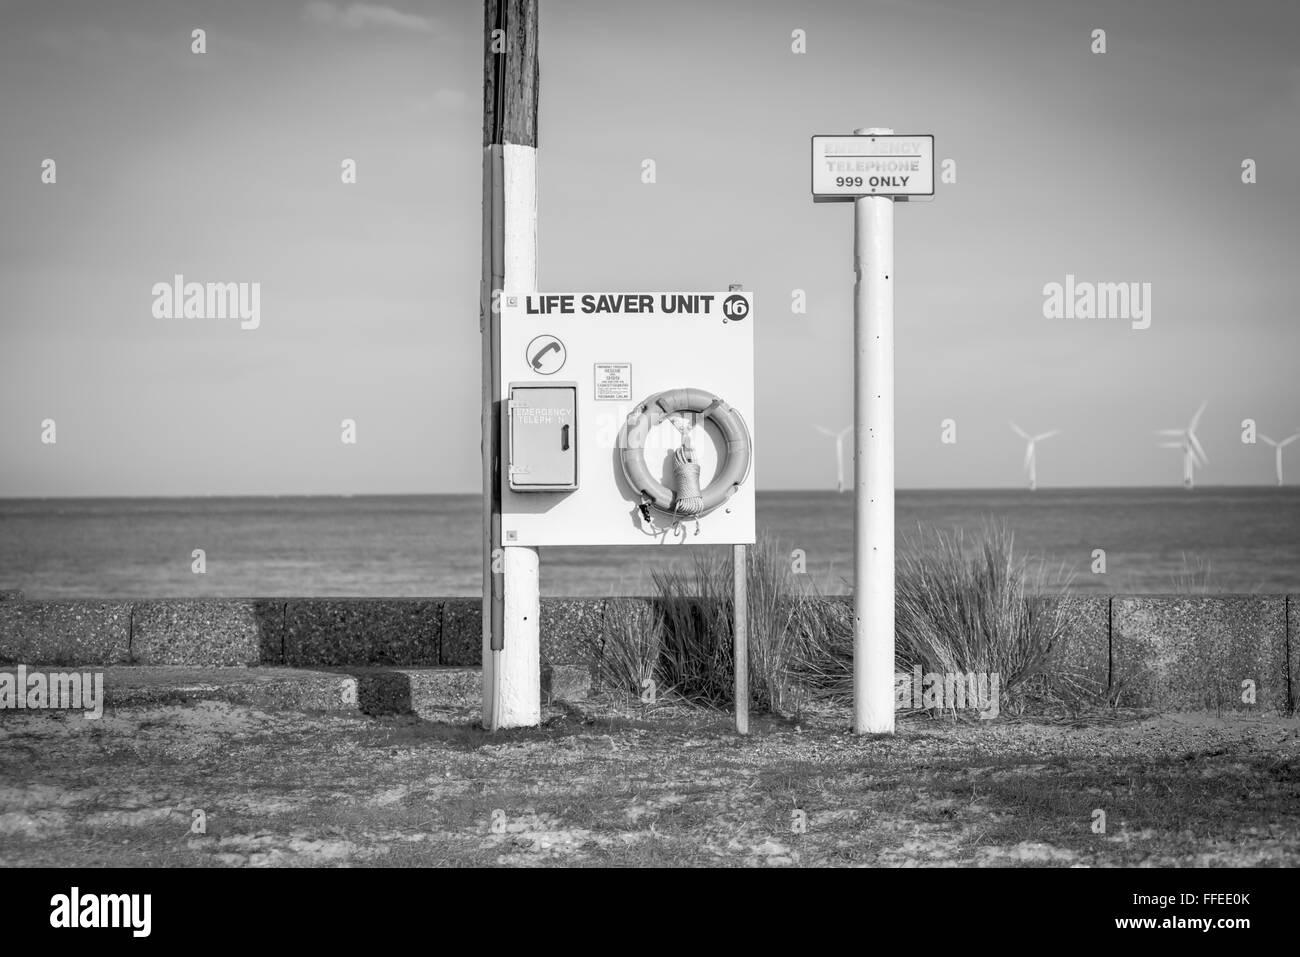 Coastal Life Saver Unit at Caister-on-Sea, England - Stock Image